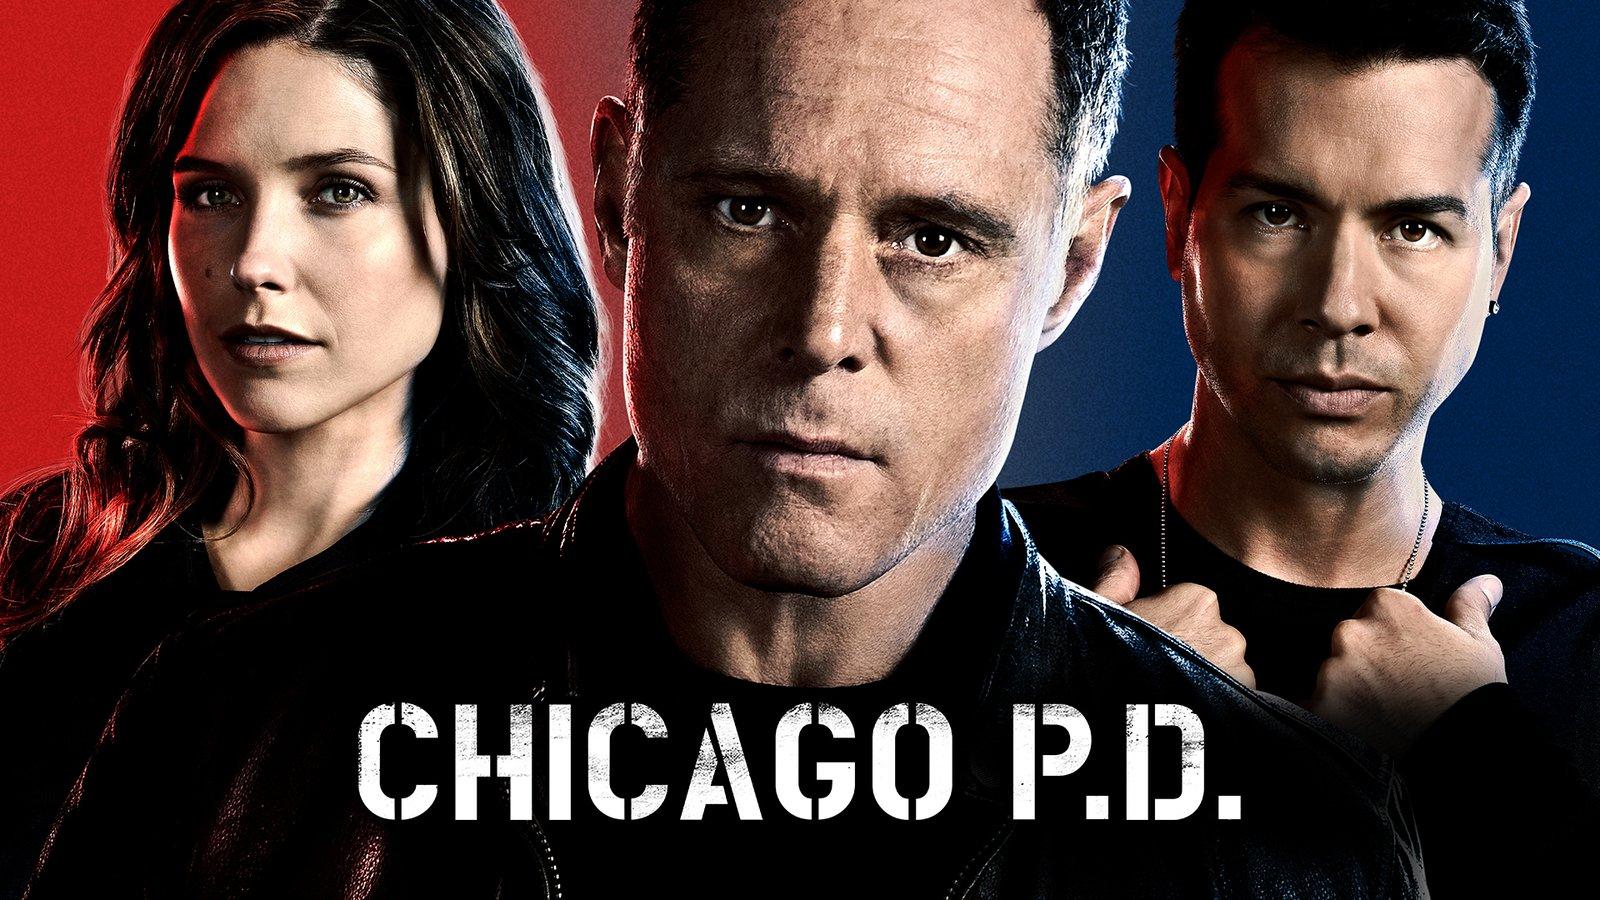 Полиция Чикаго / Chicago P.D. background